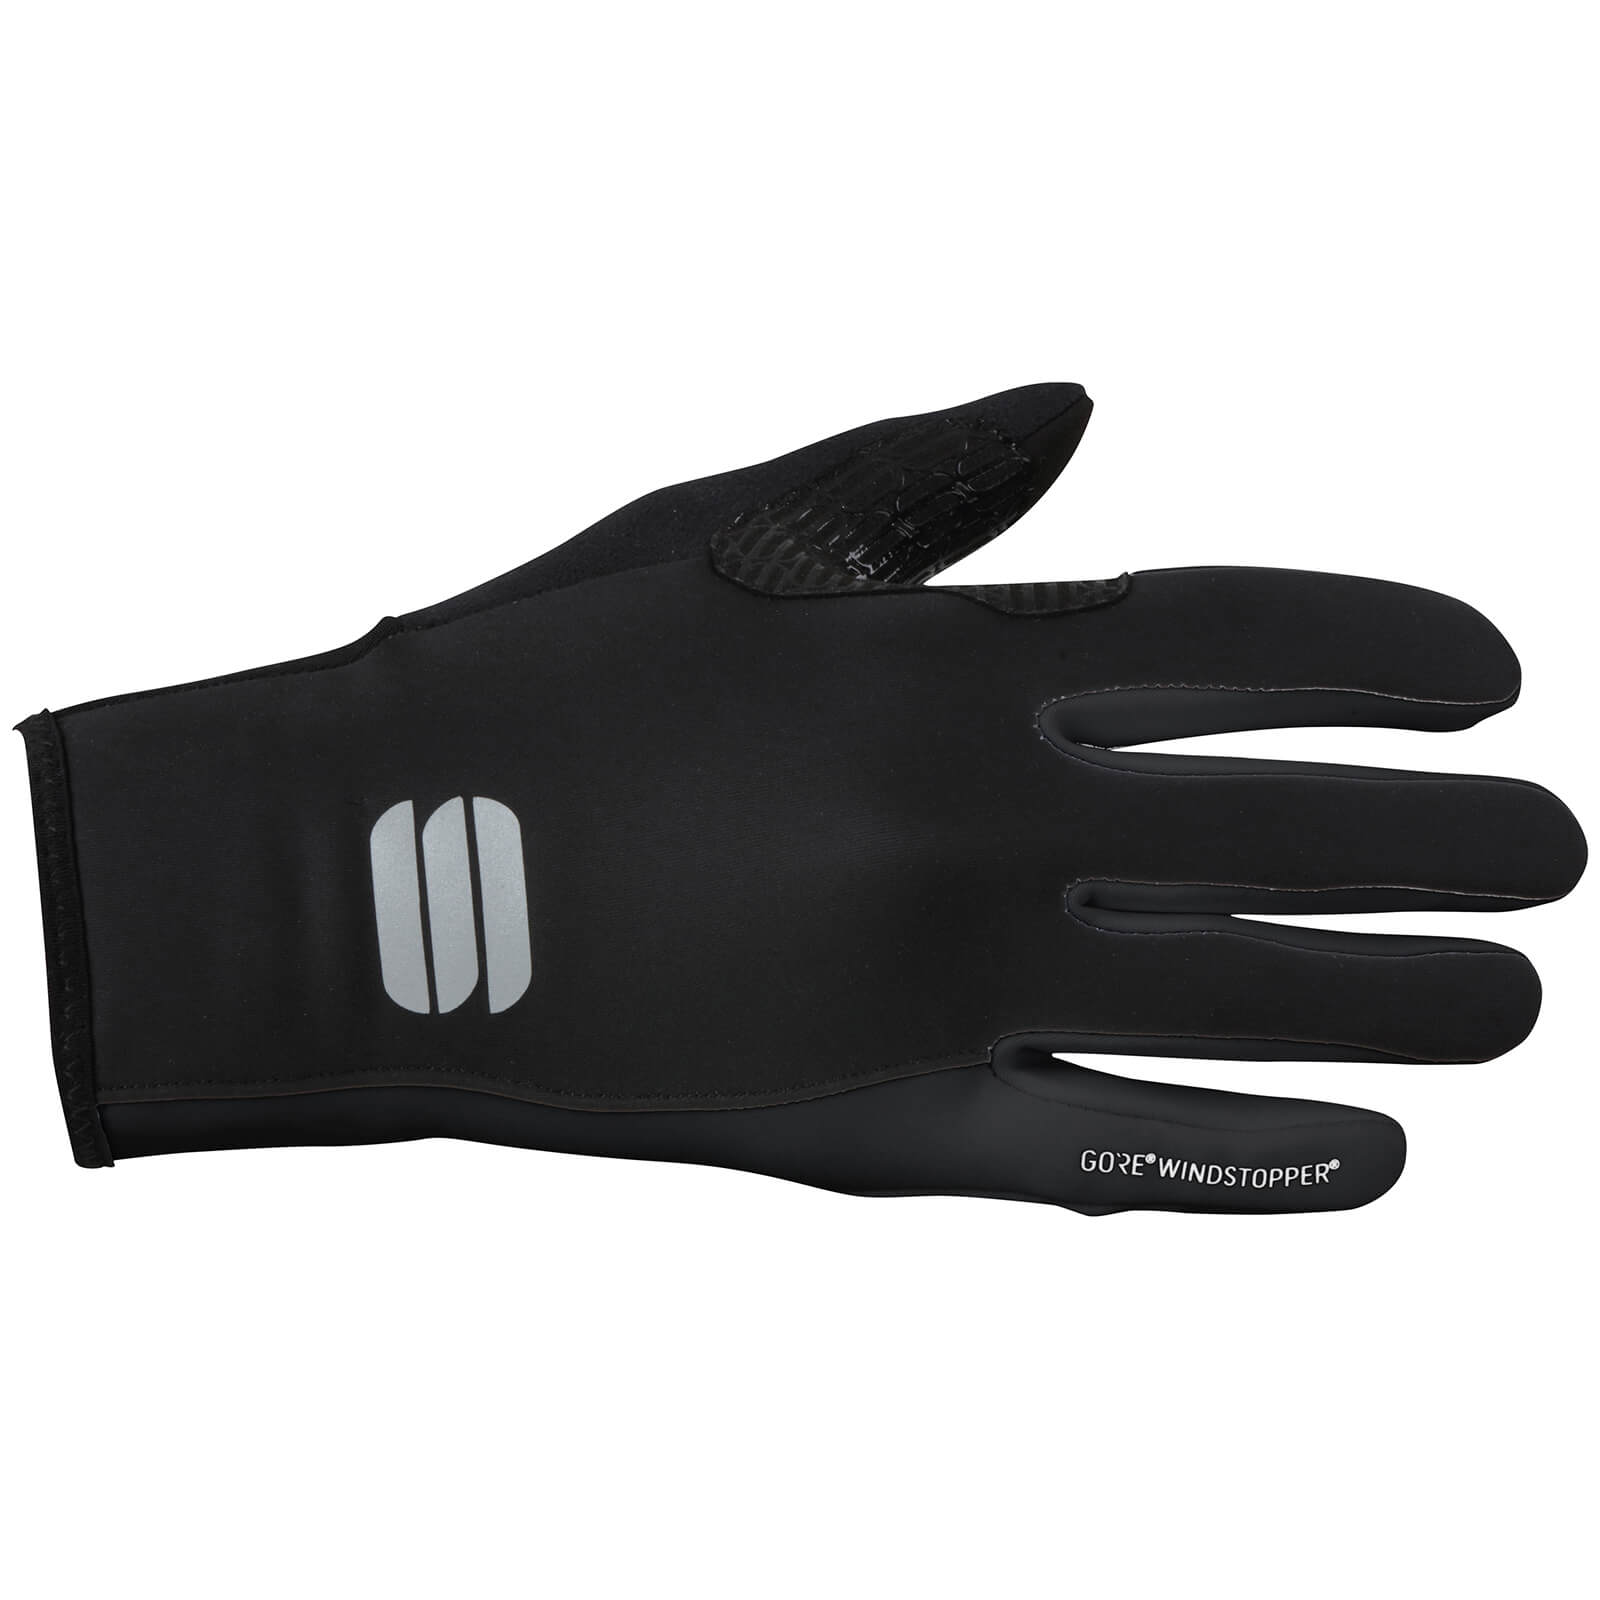 Sportful Women's Wind Stopper Essential 2 Gloves - Black | Handsker